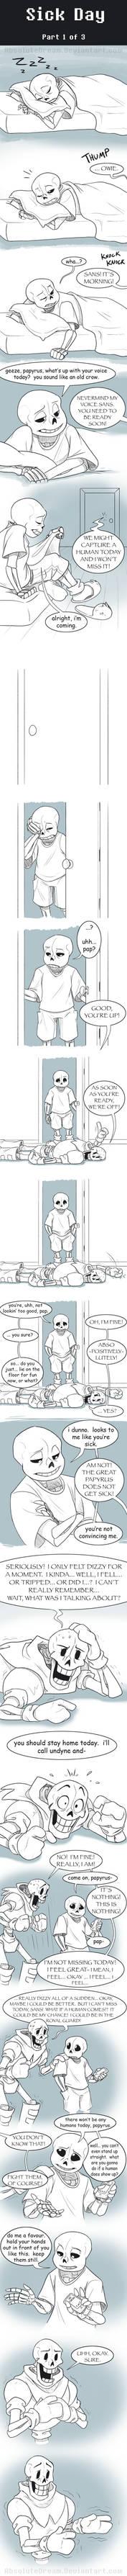 UT Comic: Sick Day Part1